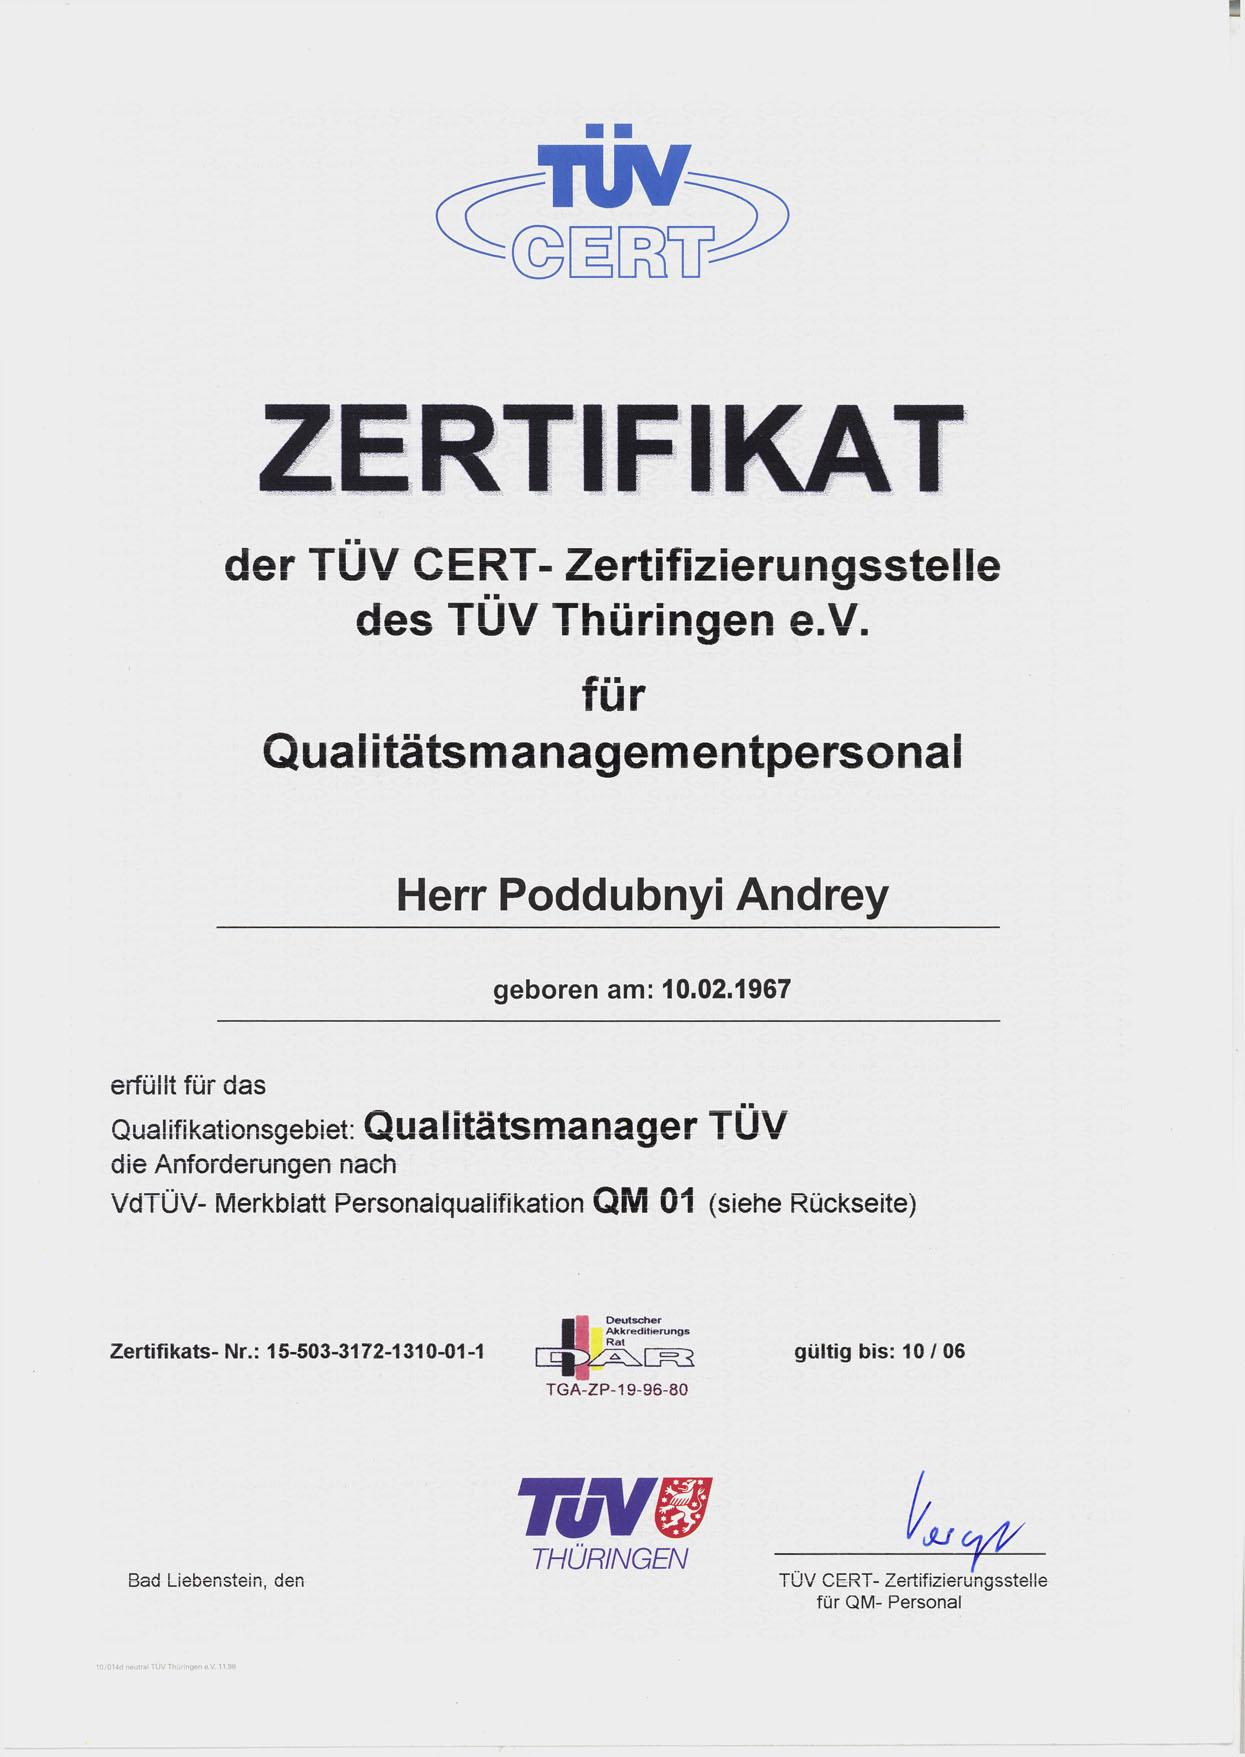 Сертификат менеджера